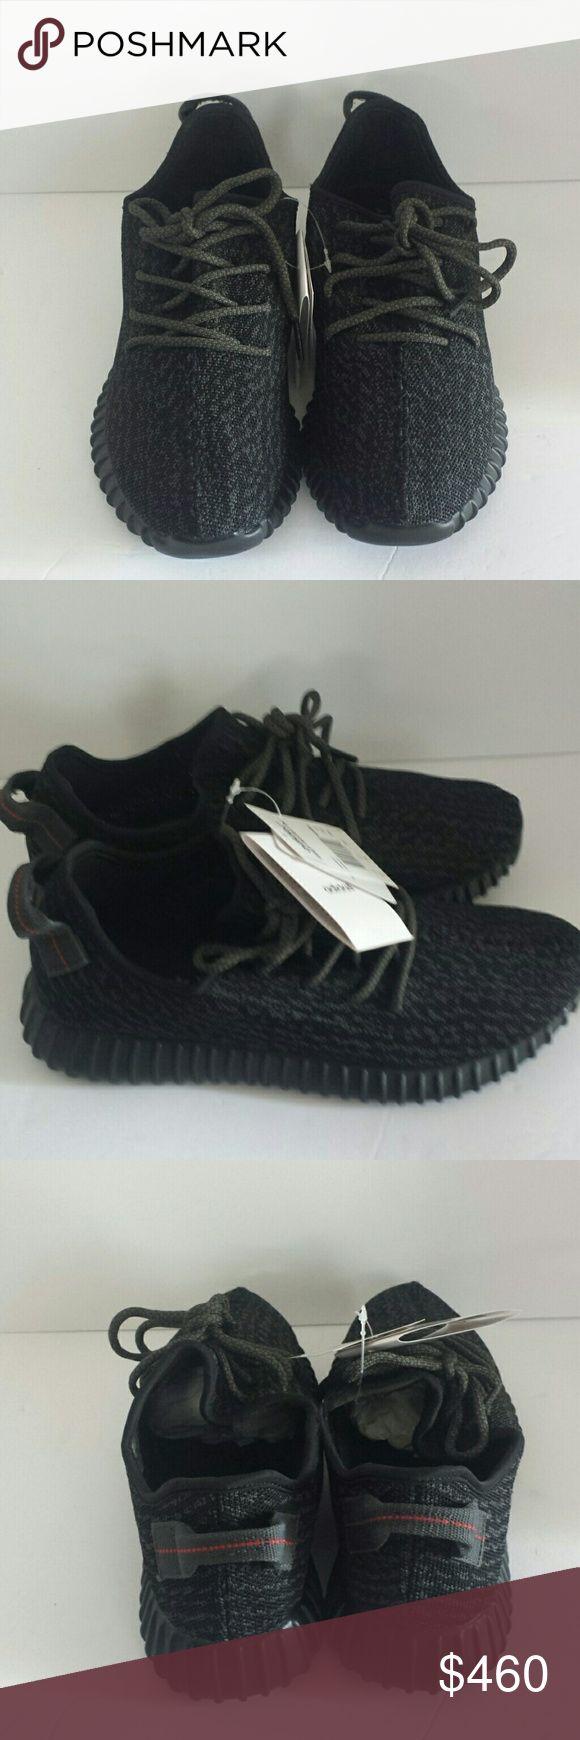 36adb8d9fef fake yeezy boost 350 adidas womens platform sneakers